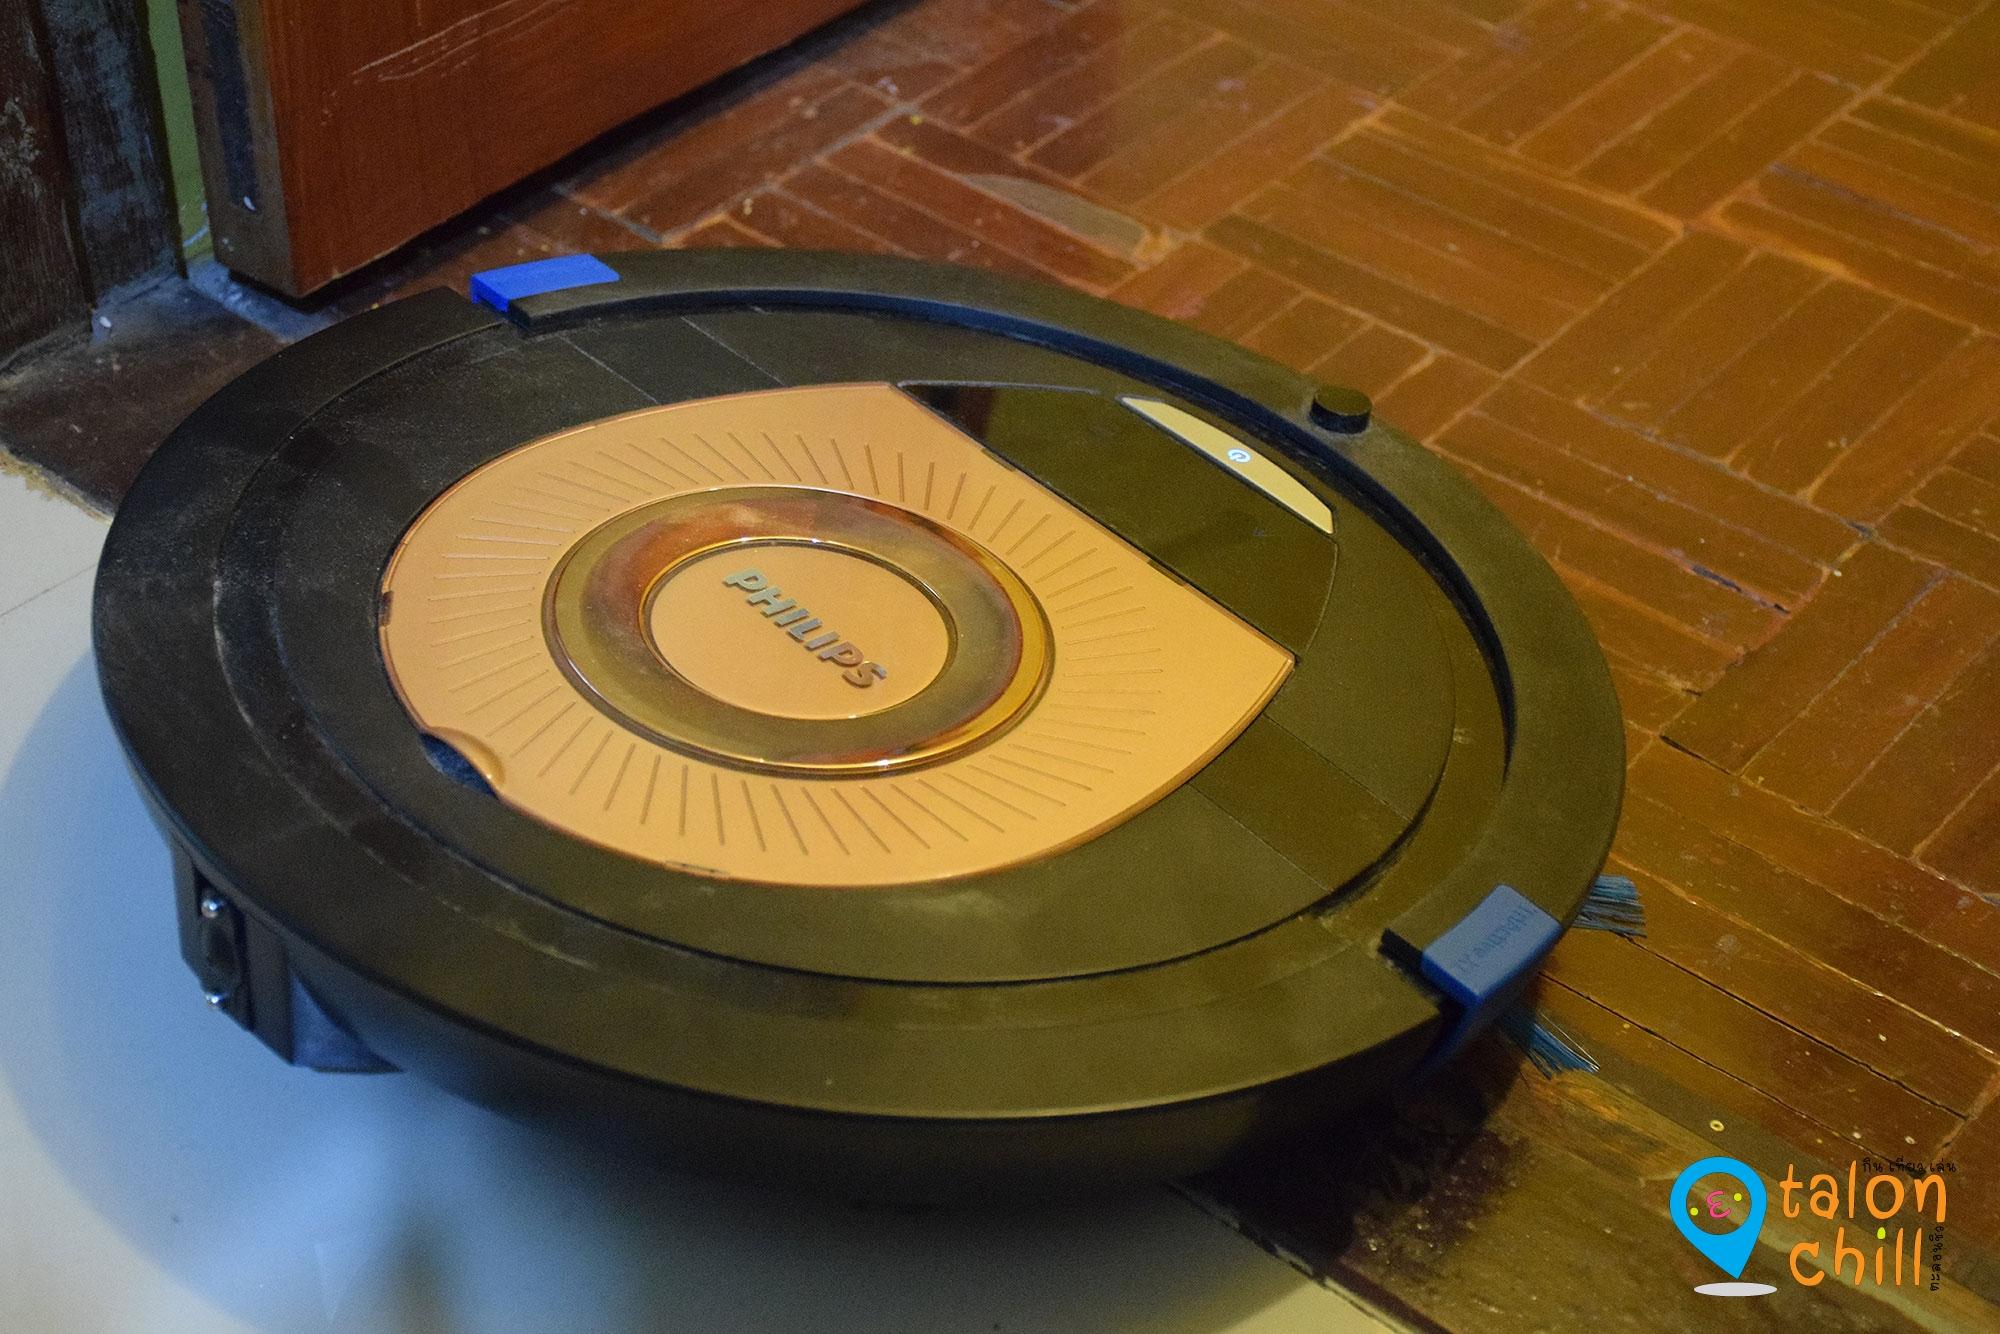 [Review] หุ่นยนต์ดูดฝุ่นอัจฉริยะ FC8776 ทำความสะอาดเร็วขึ้น 2 เท่า by Philips